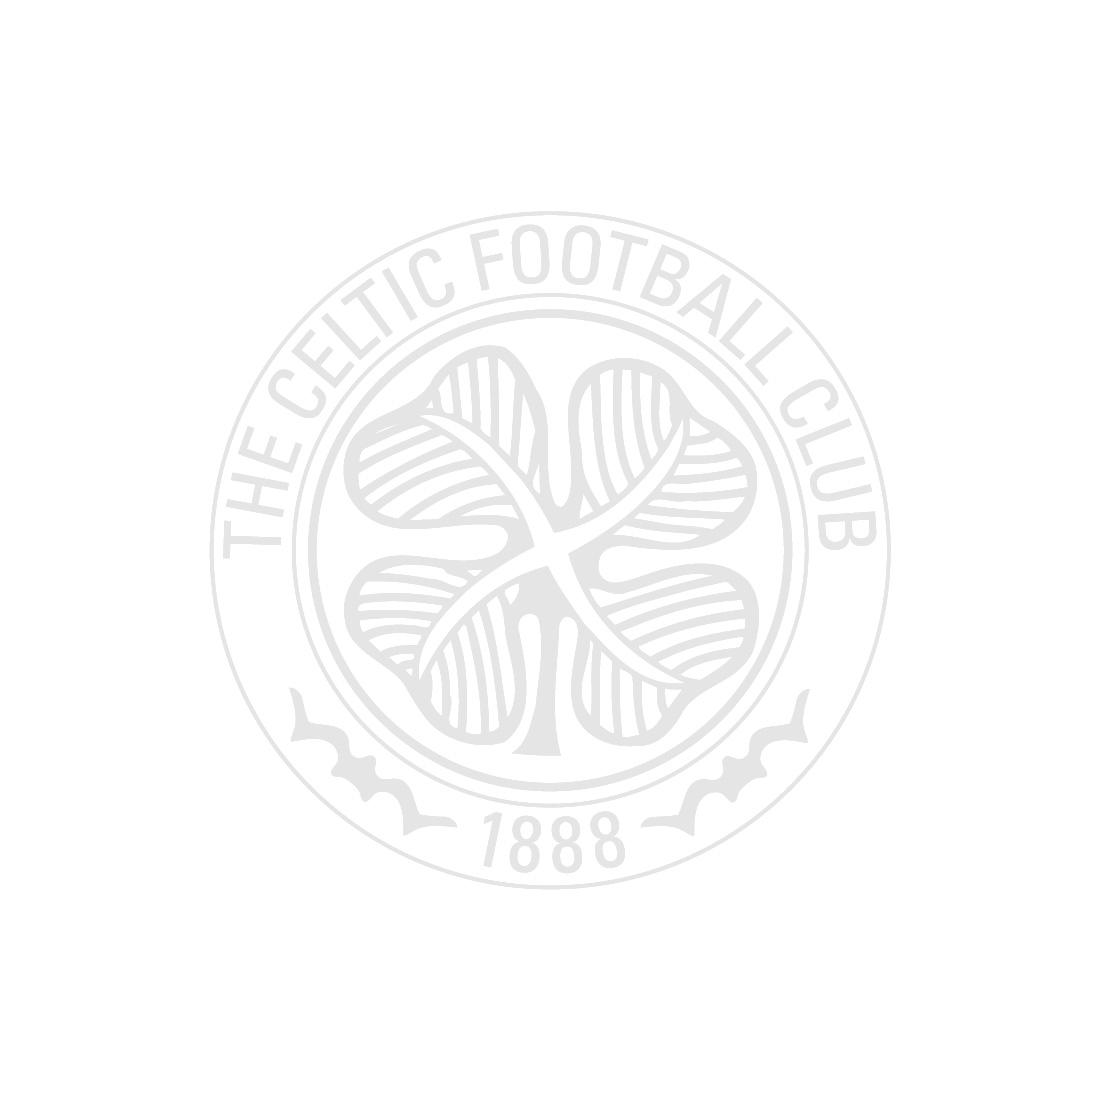 Celtic 20/21 Home Kit Pin Badge